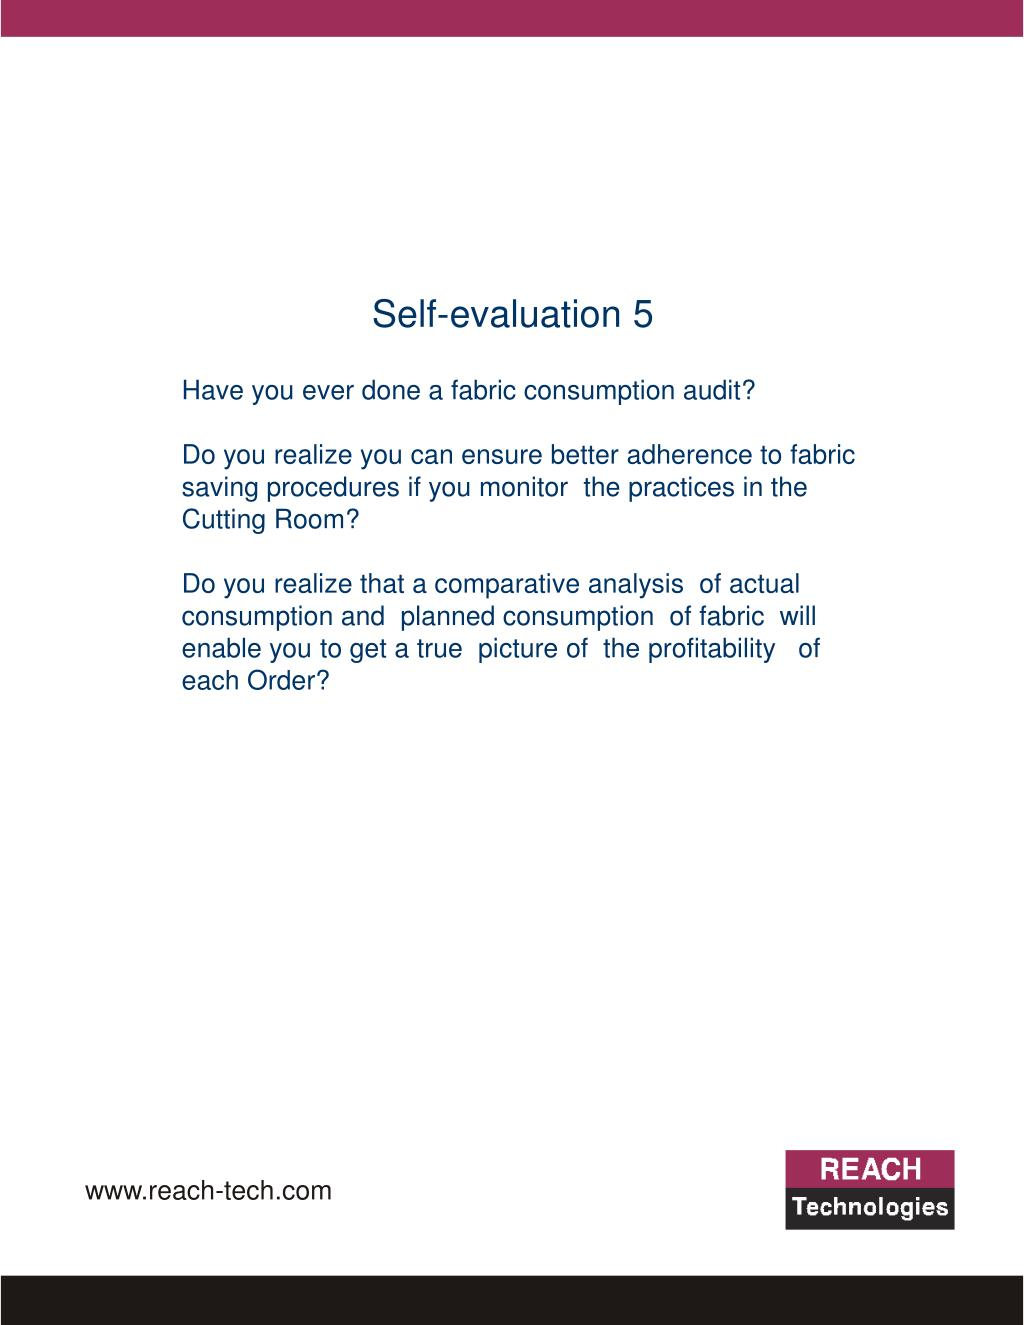 Self-evaluation 5